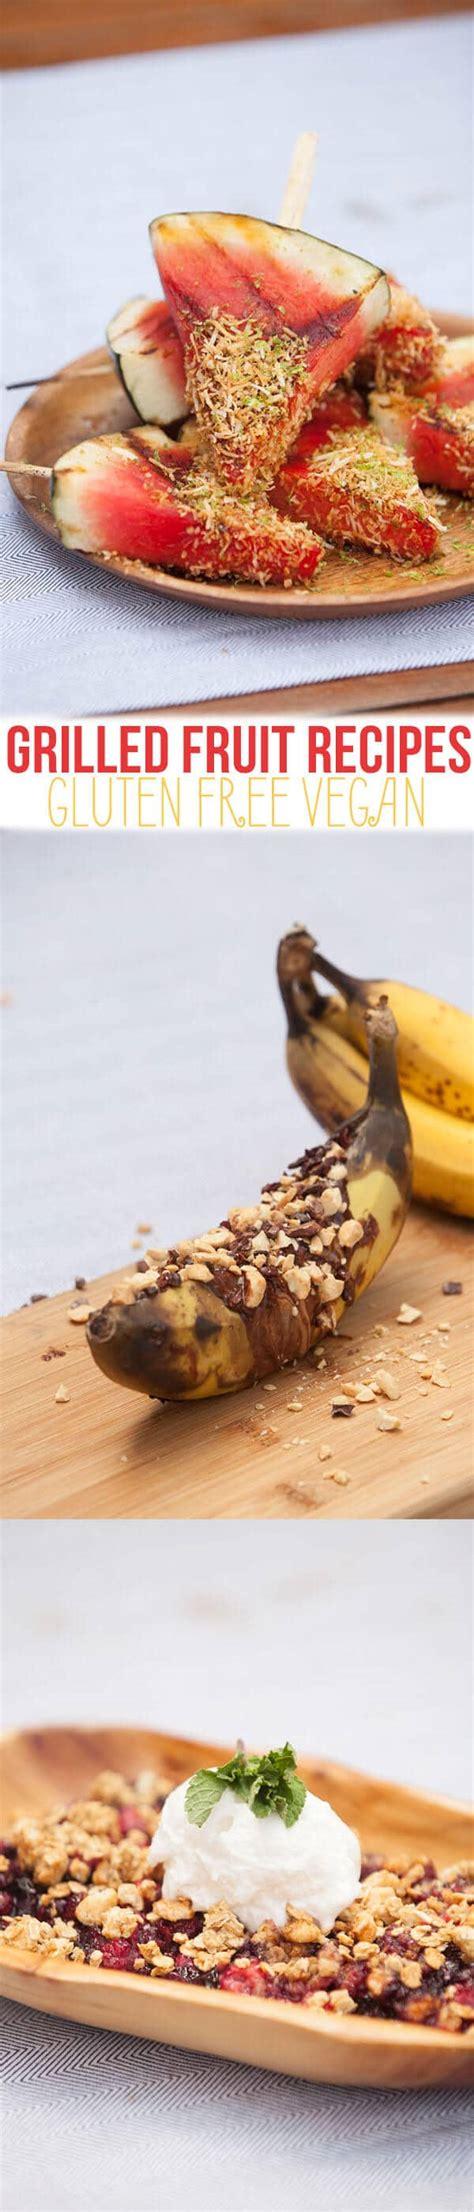 is banana boat gluten free gluten free vegan grilled fruit recipes banana boats